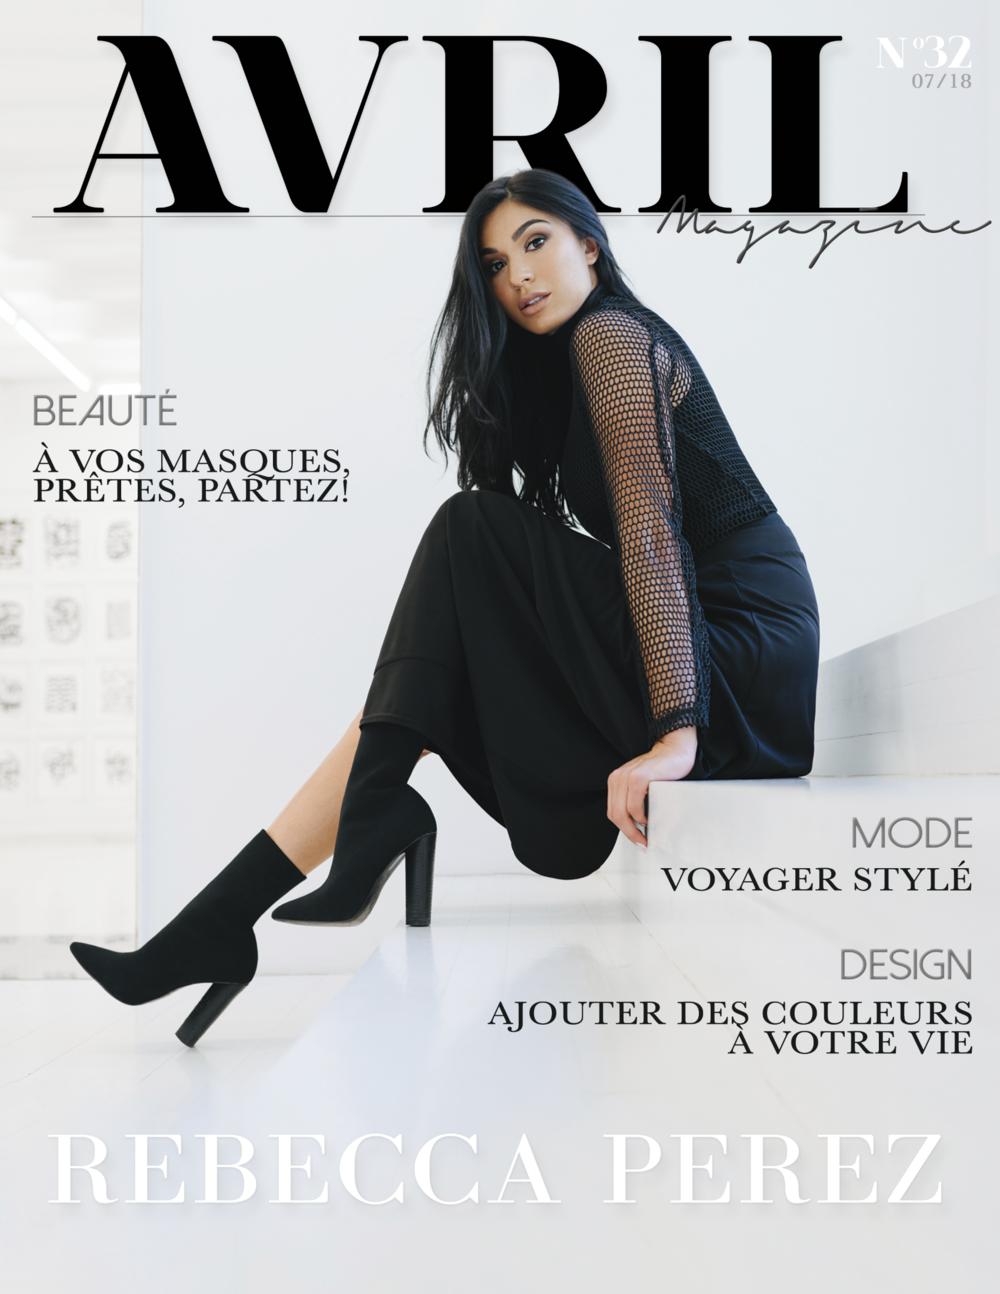 Cover-rebecca-juillet-2018.jpg